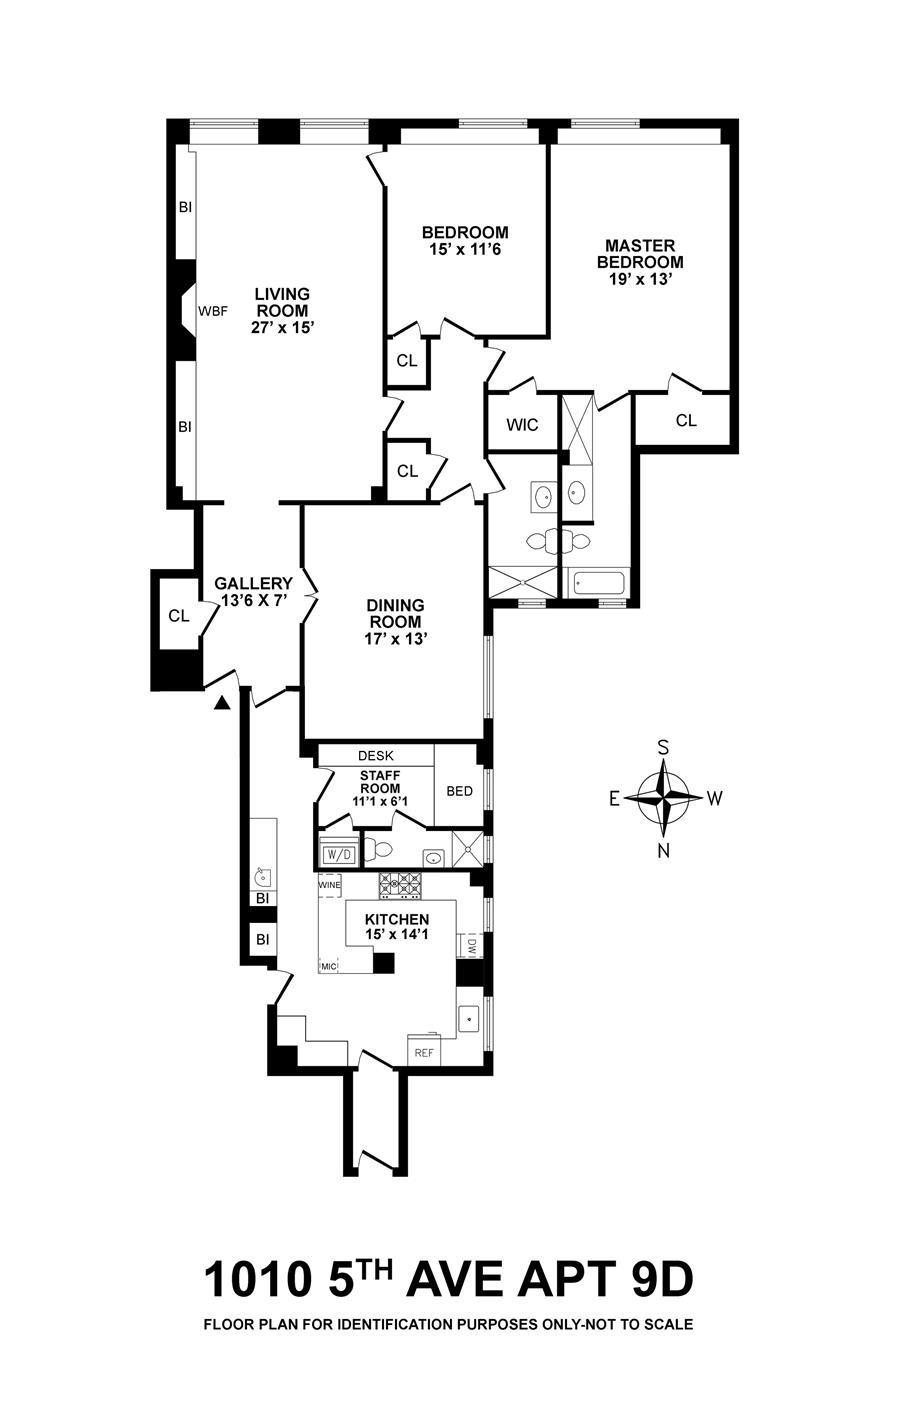 Floor plan of 1010 TENANTS CORP, 1010 Fifth Avenue, 9D - Upper East Side, New York